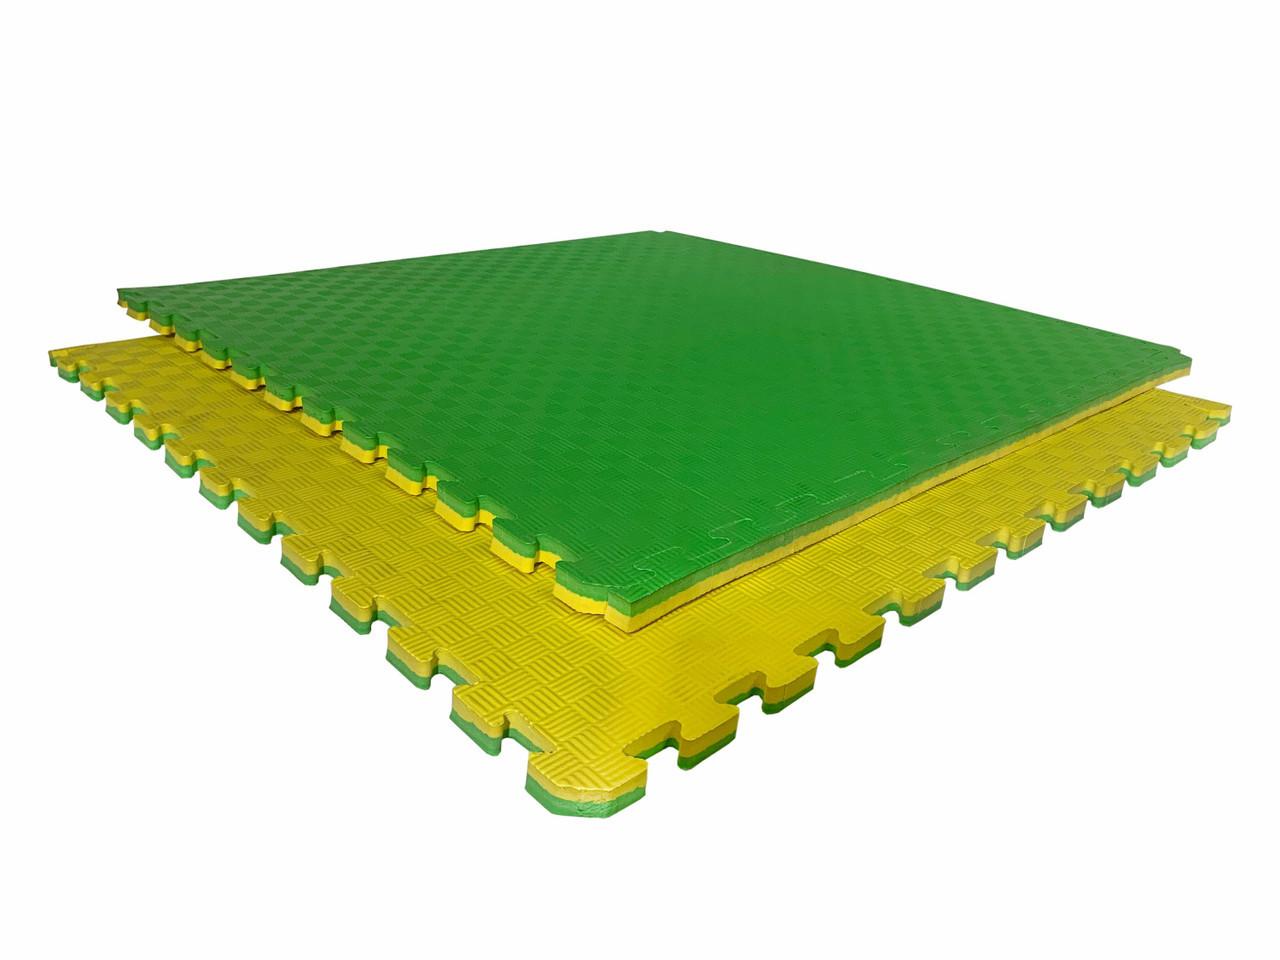 "Мат-татамі Ланор ""ластівчин хвіст"" 80 кг/м3 20мм зелено-жовті Т1"